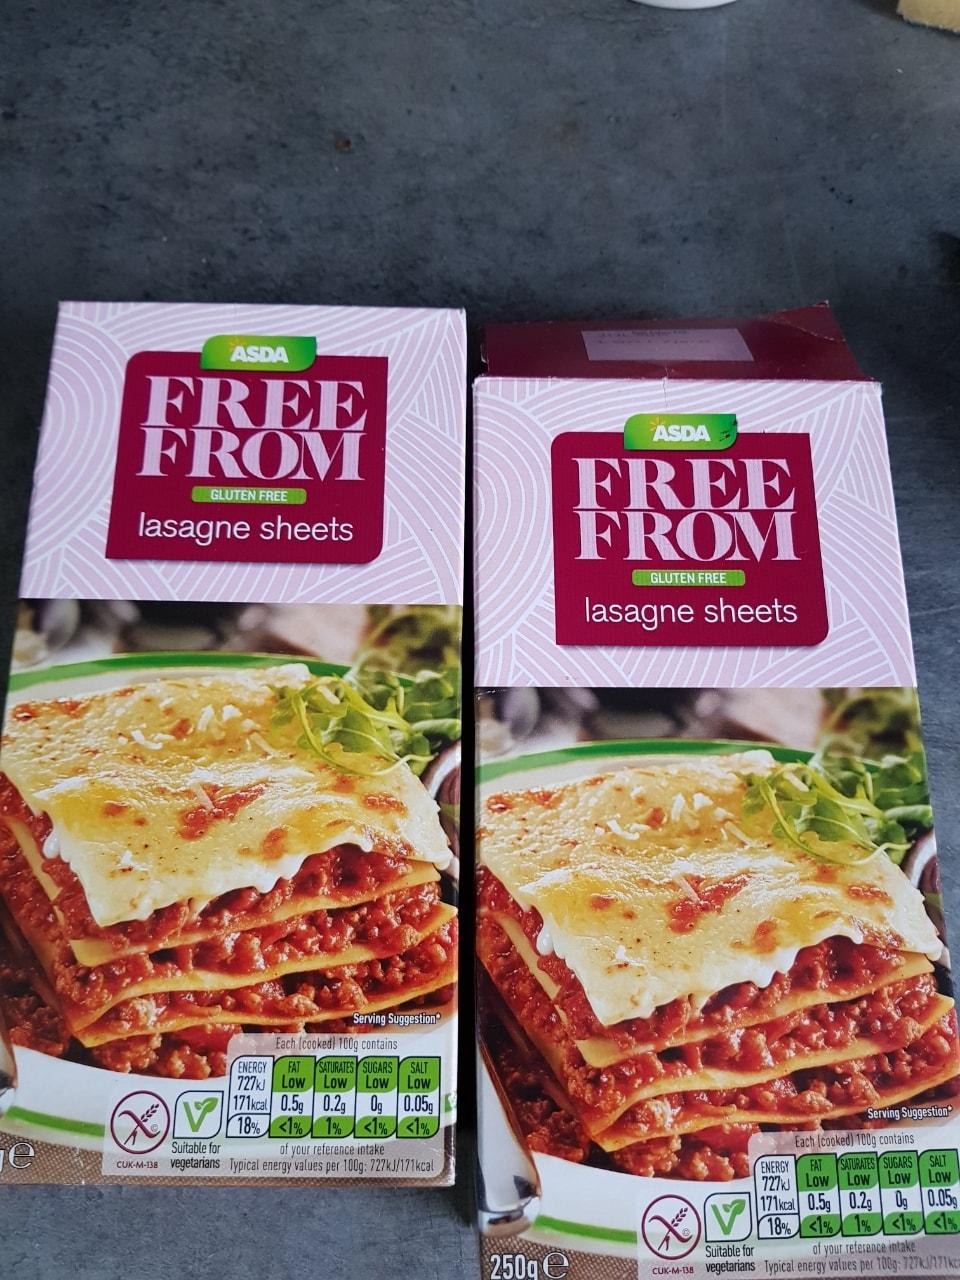 Gluten-free lasagne sheets